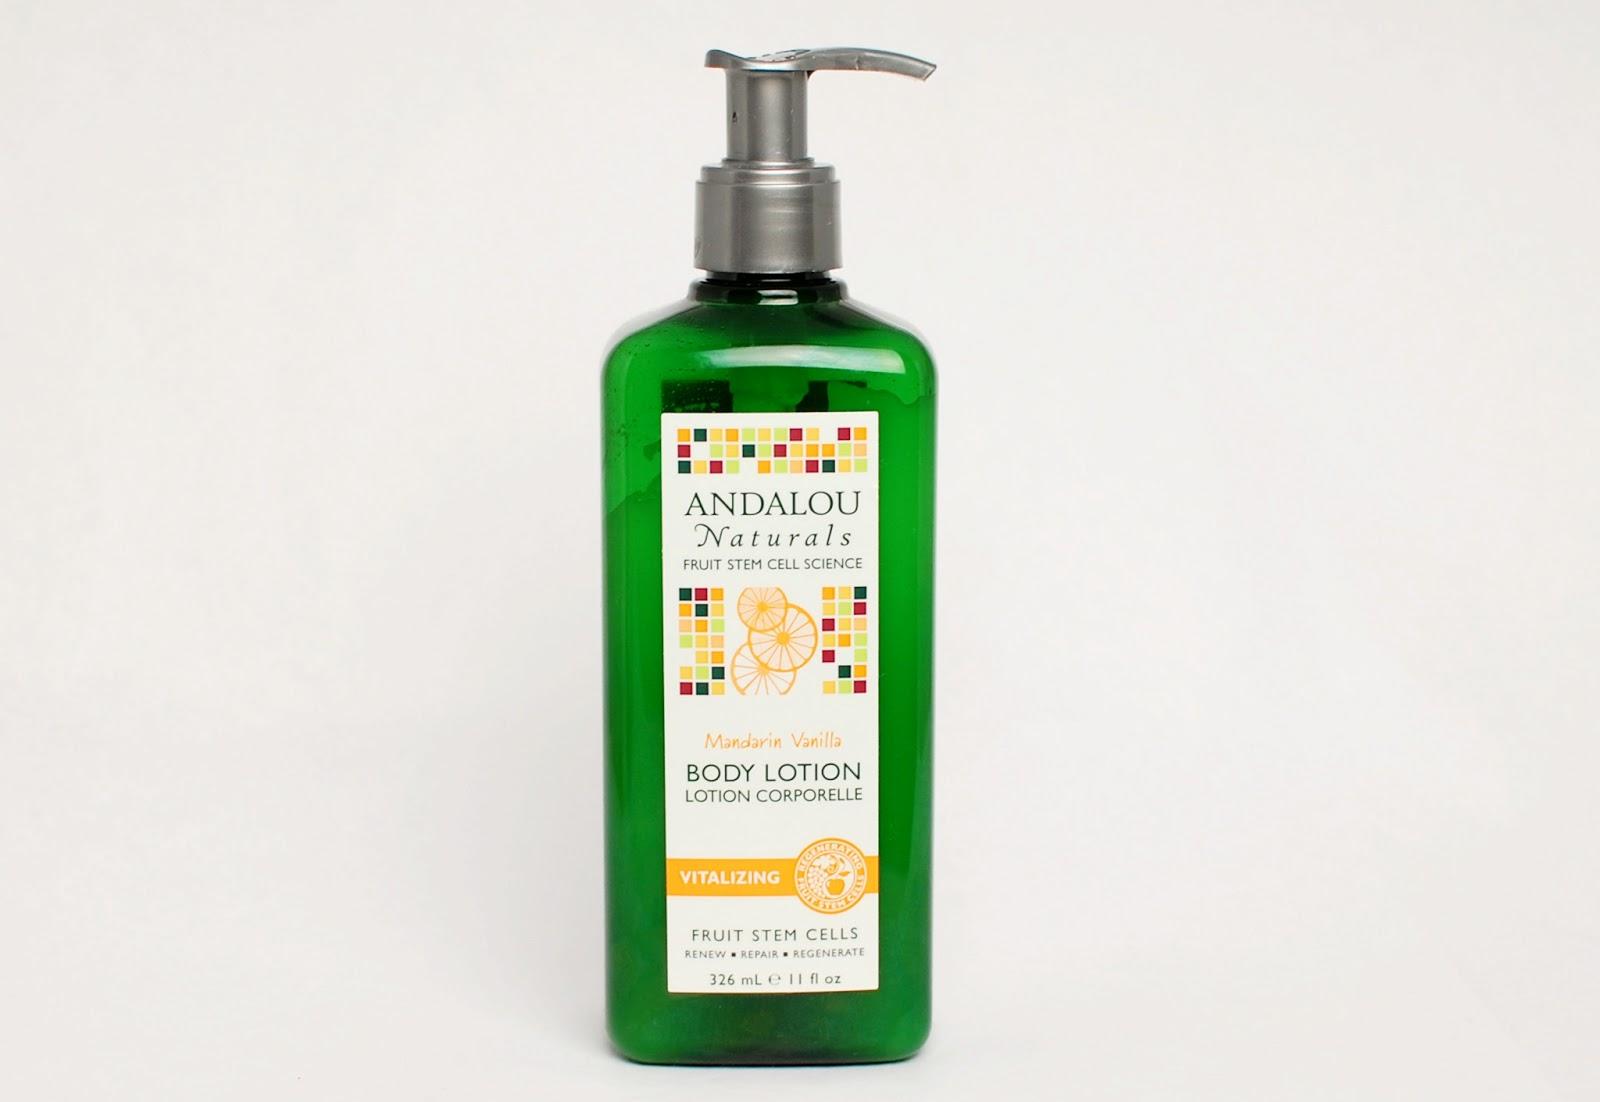 Andalou Naturals Body Lotion Mandarin Vanilla